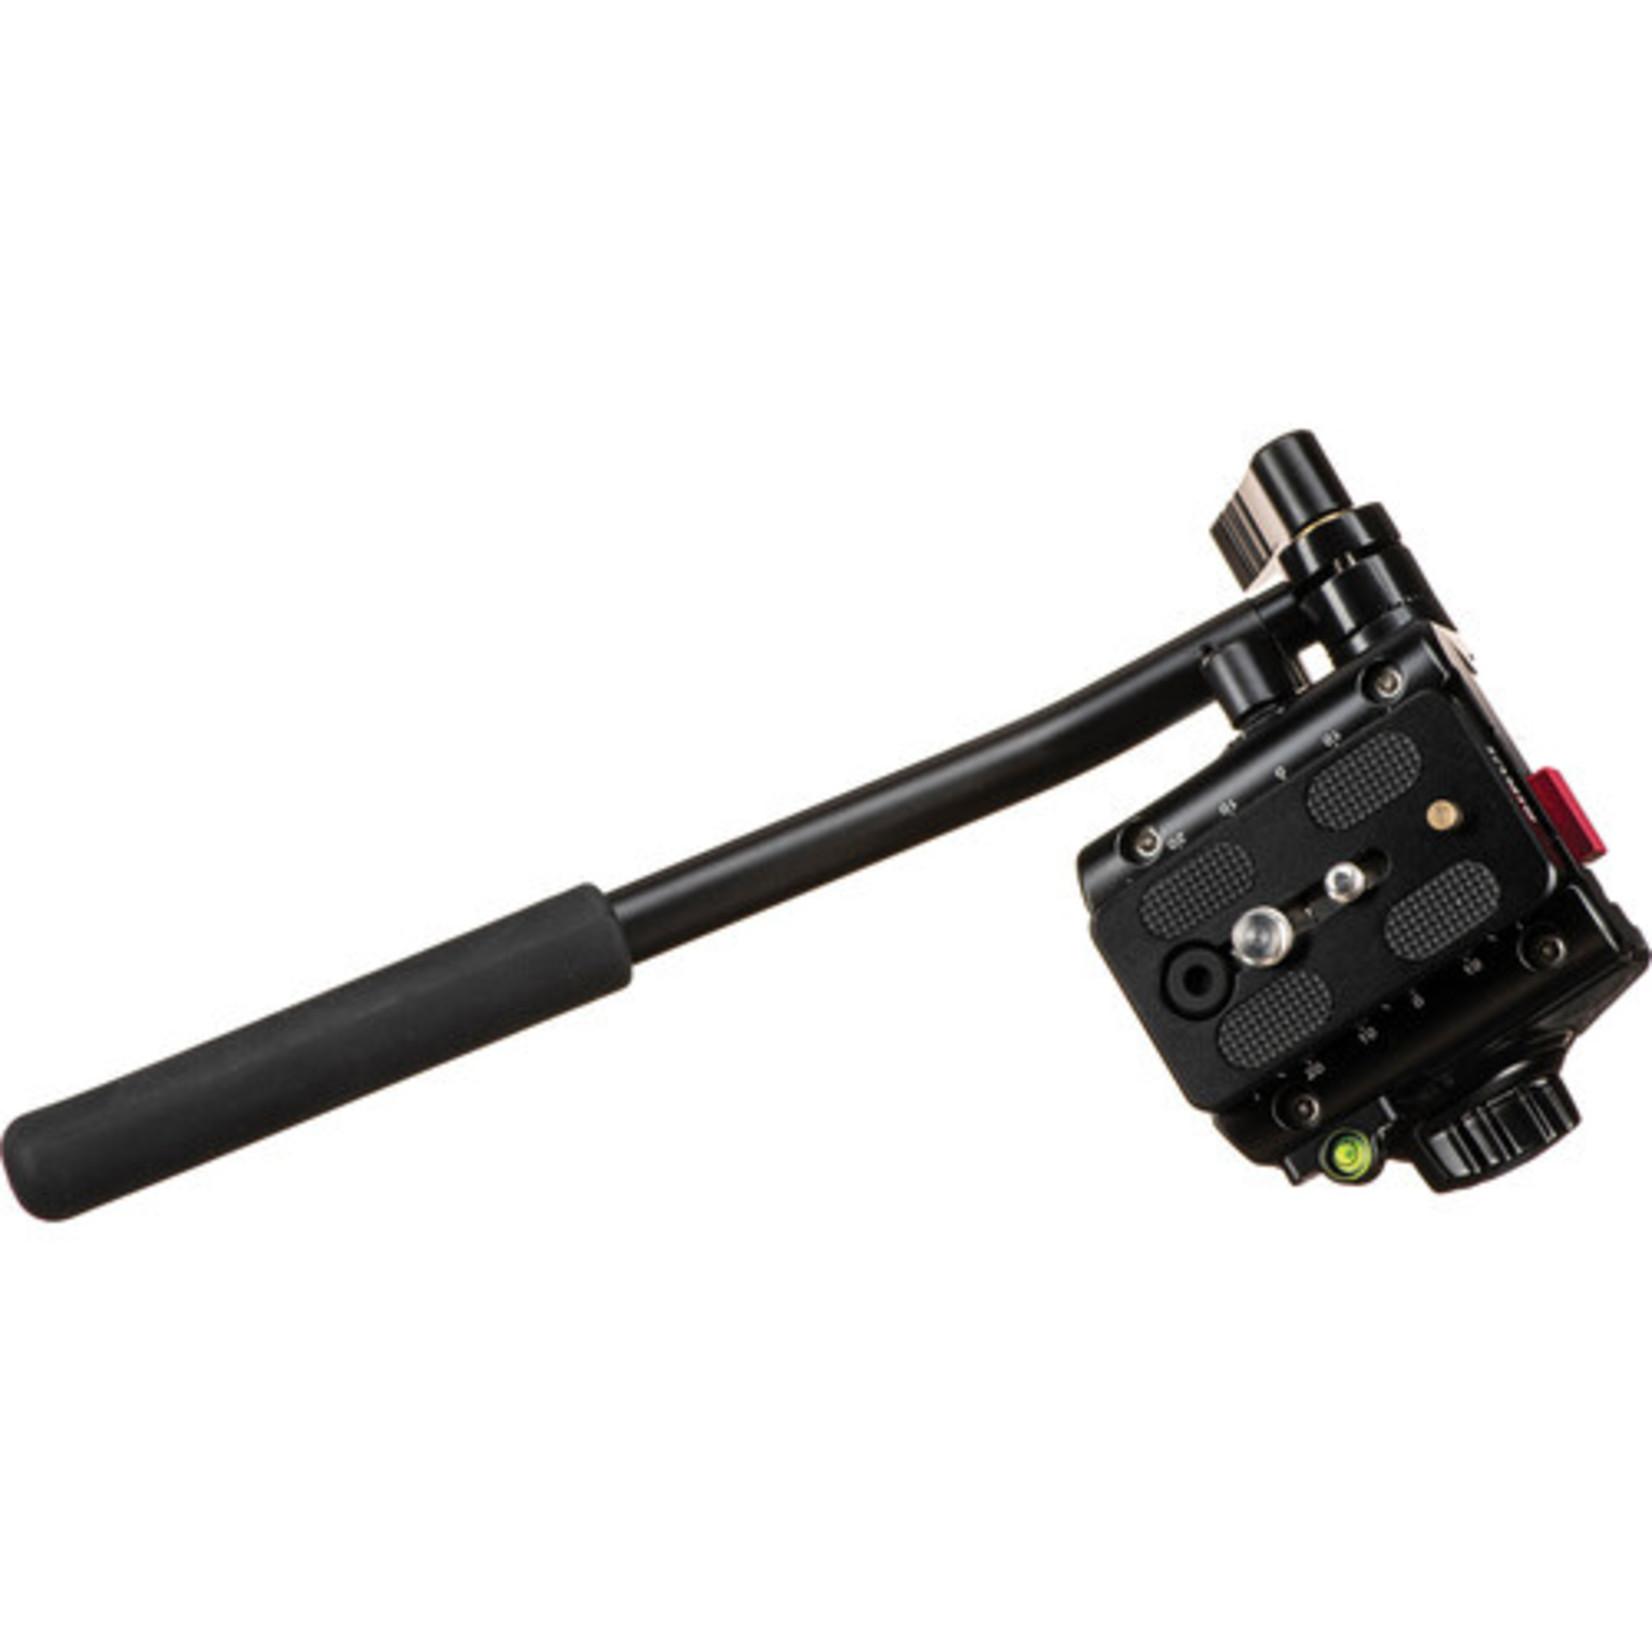 Sirui Sirui VA-5 Ultra-Compact Video Head